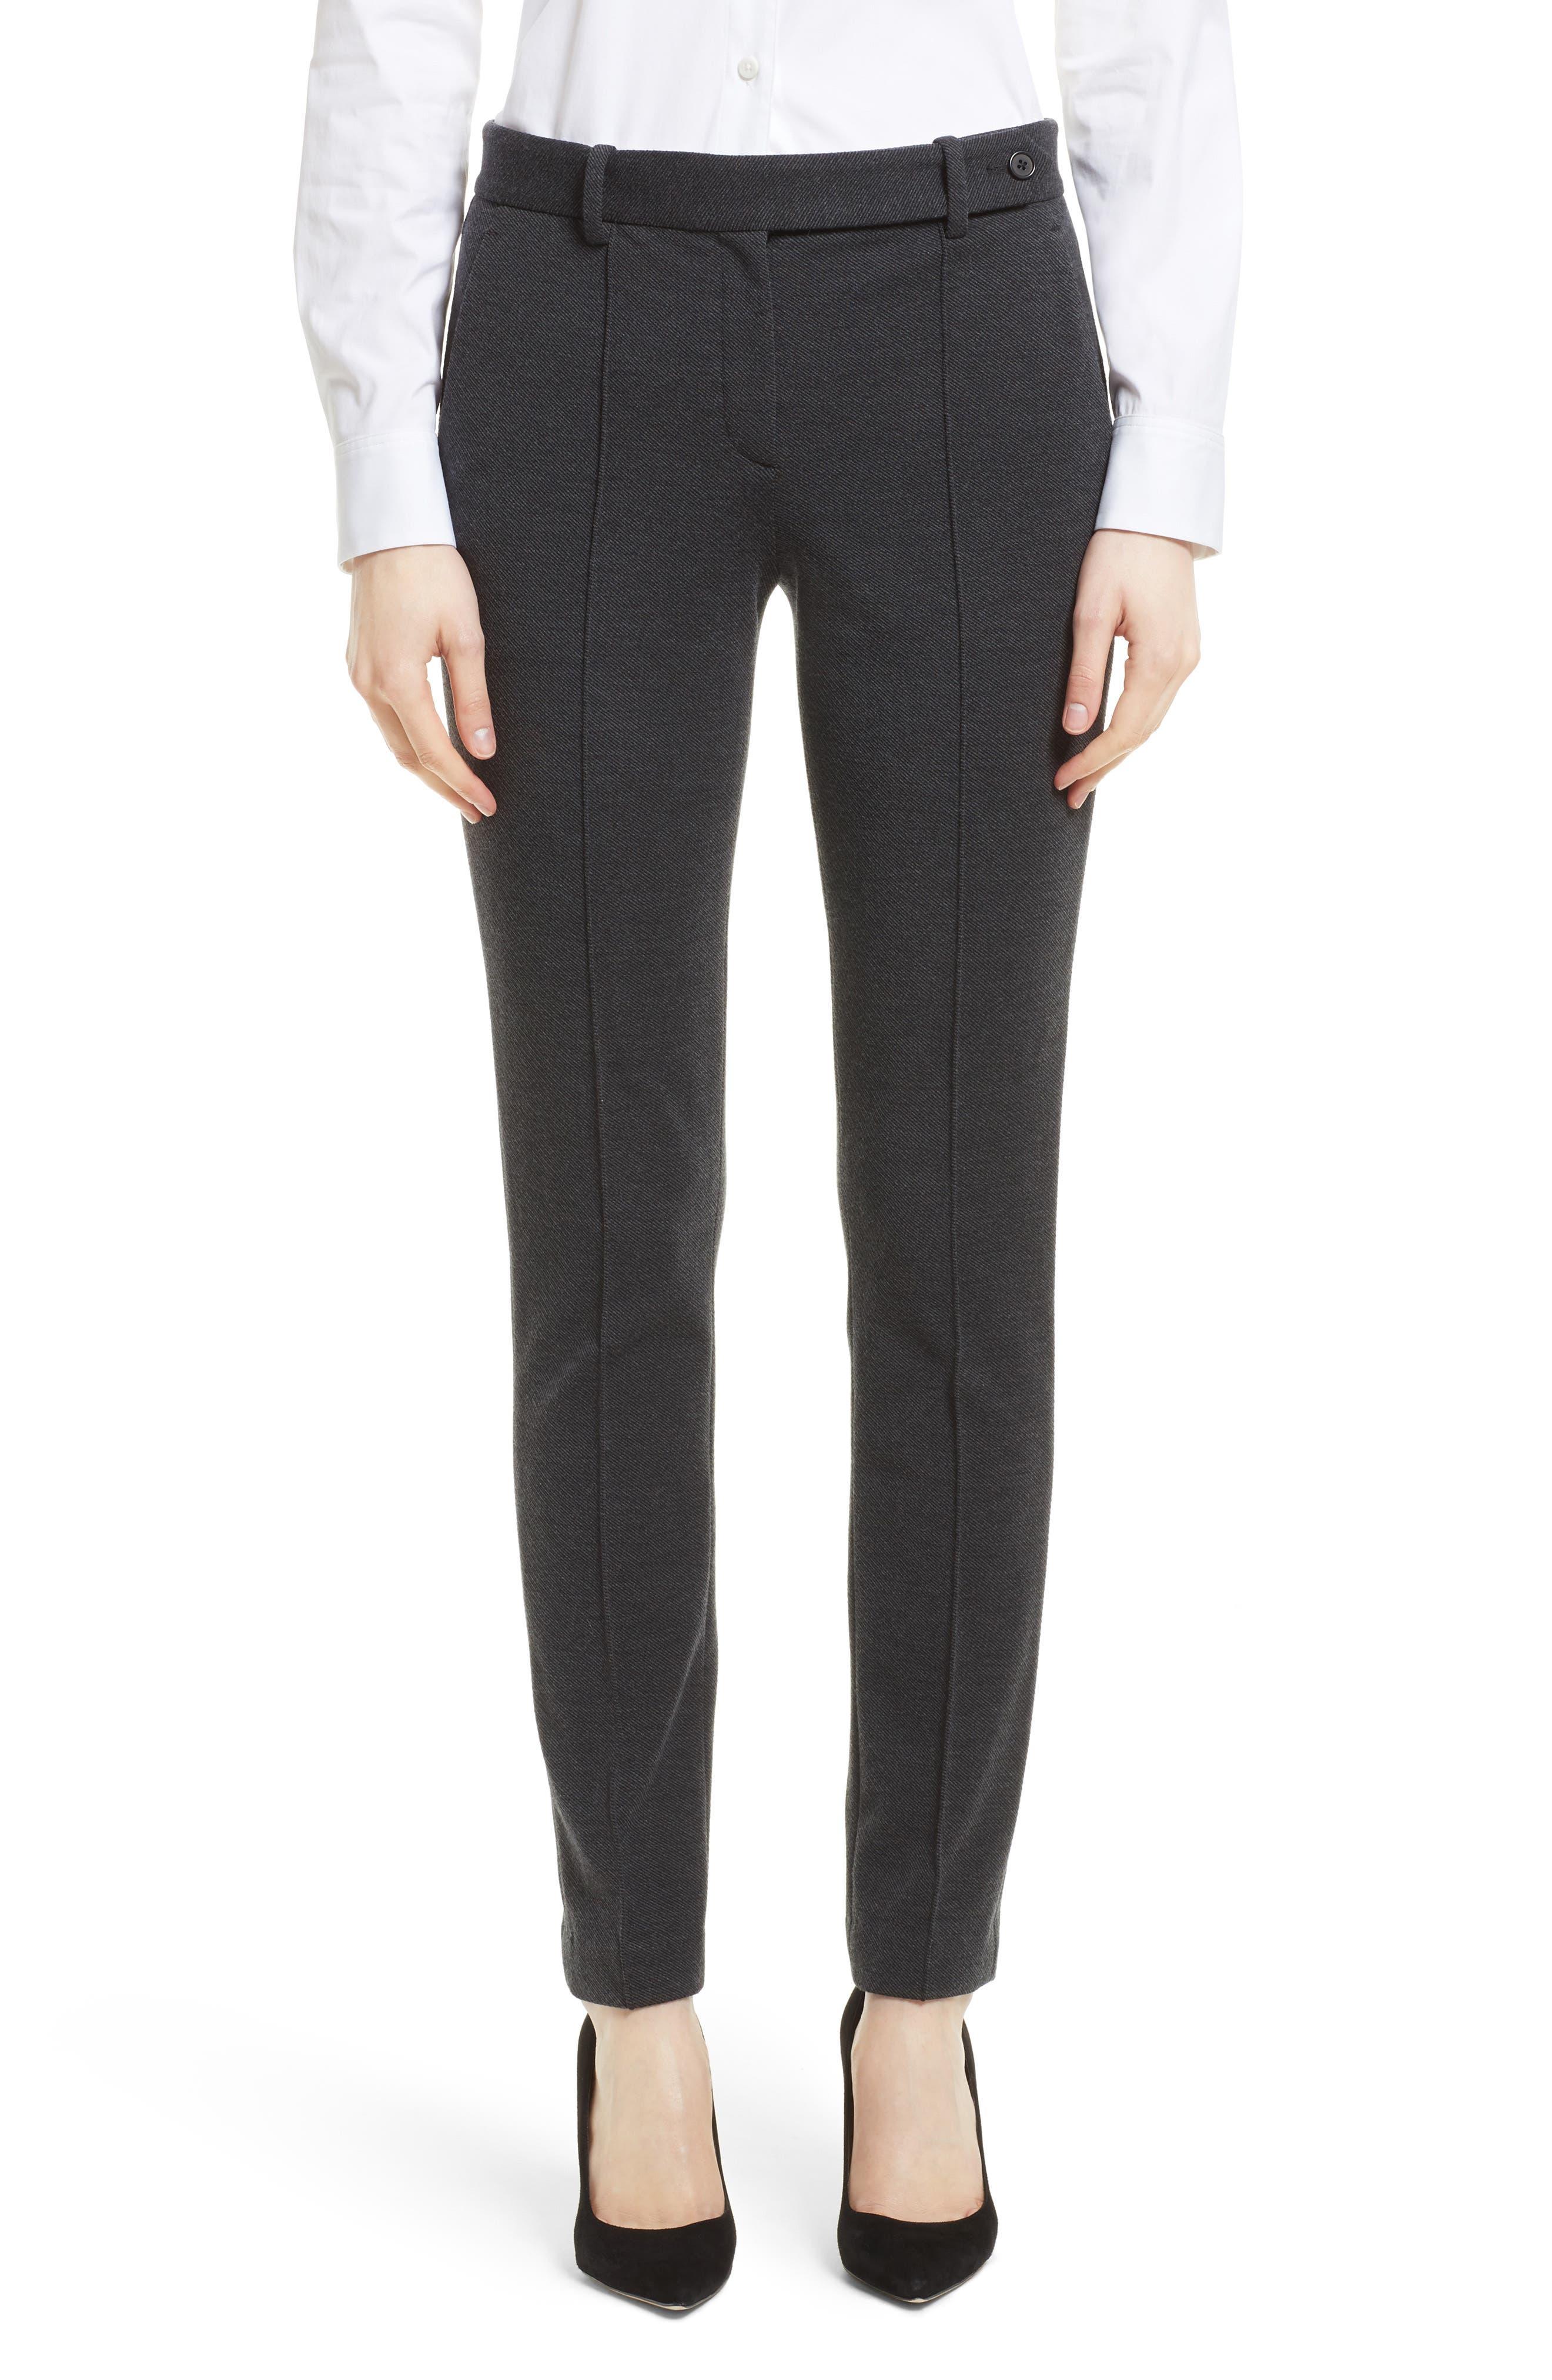 Pintuck Knit Twill Pants,                         Main,                         color, 029